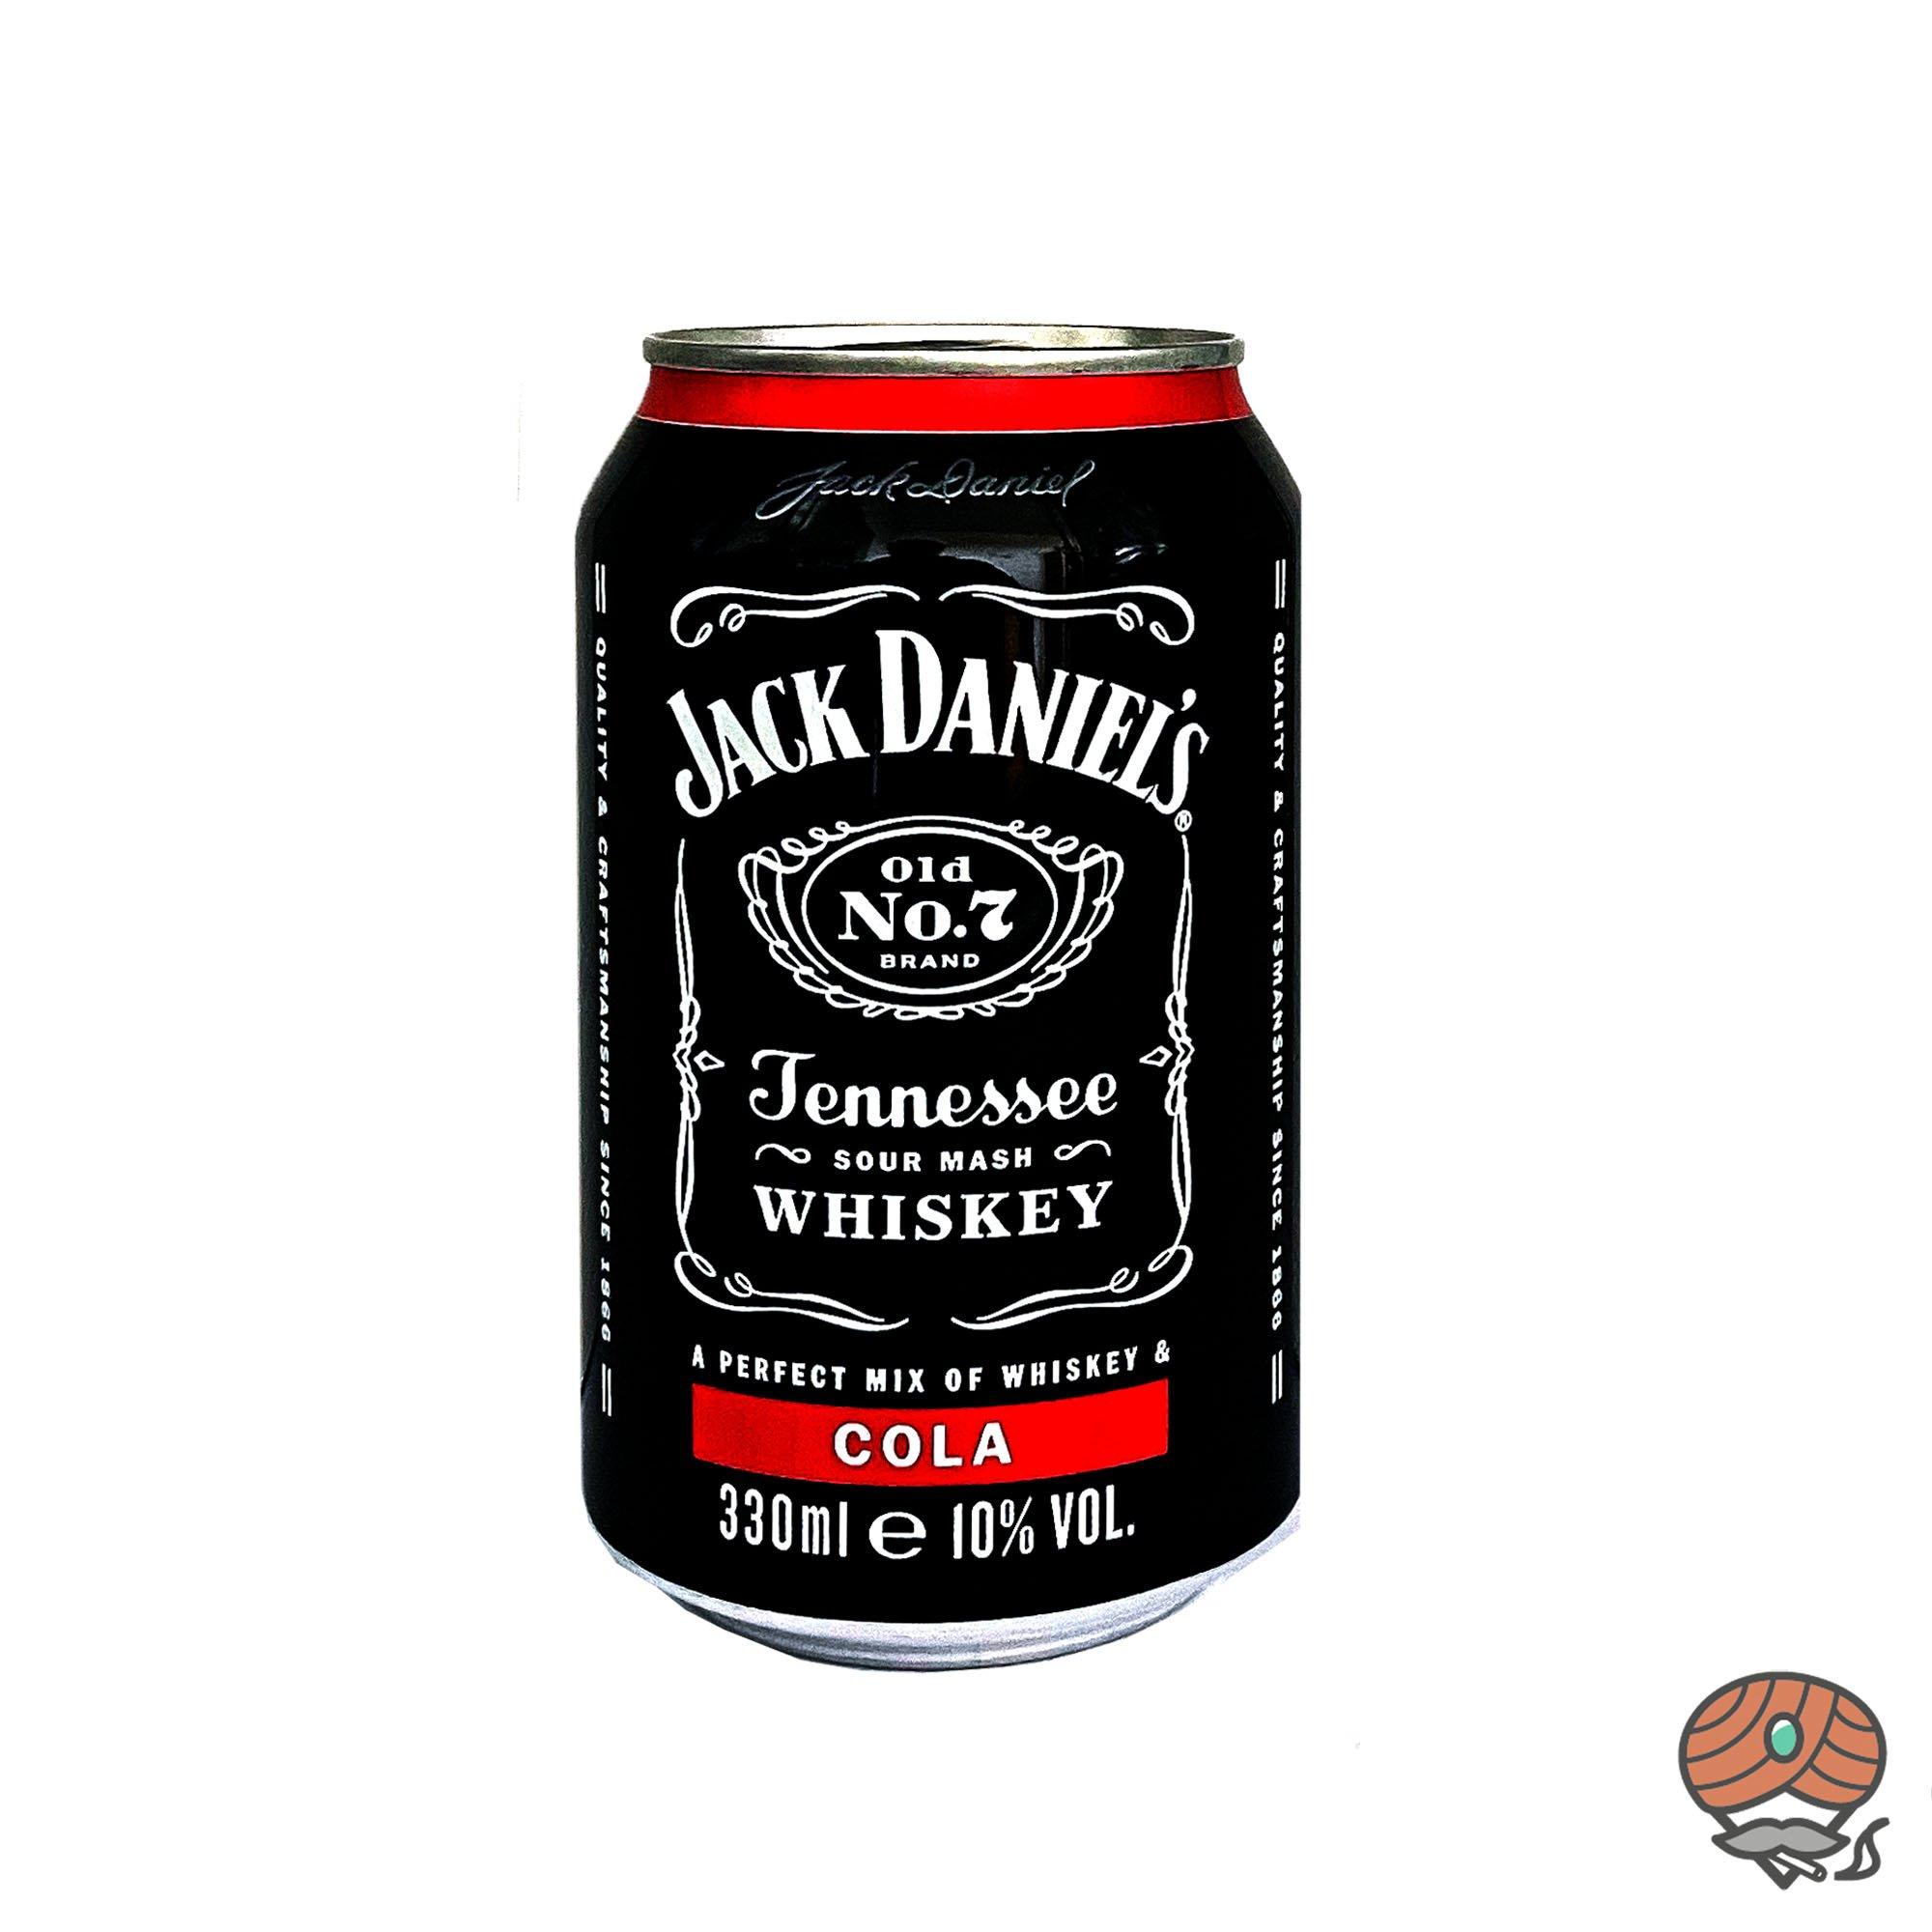 Jack Daniel´s Old No. 7 - Cola Mixgetränk 0,33 l inkl.0,25 Euro Pfand (alc. 10% Vol)